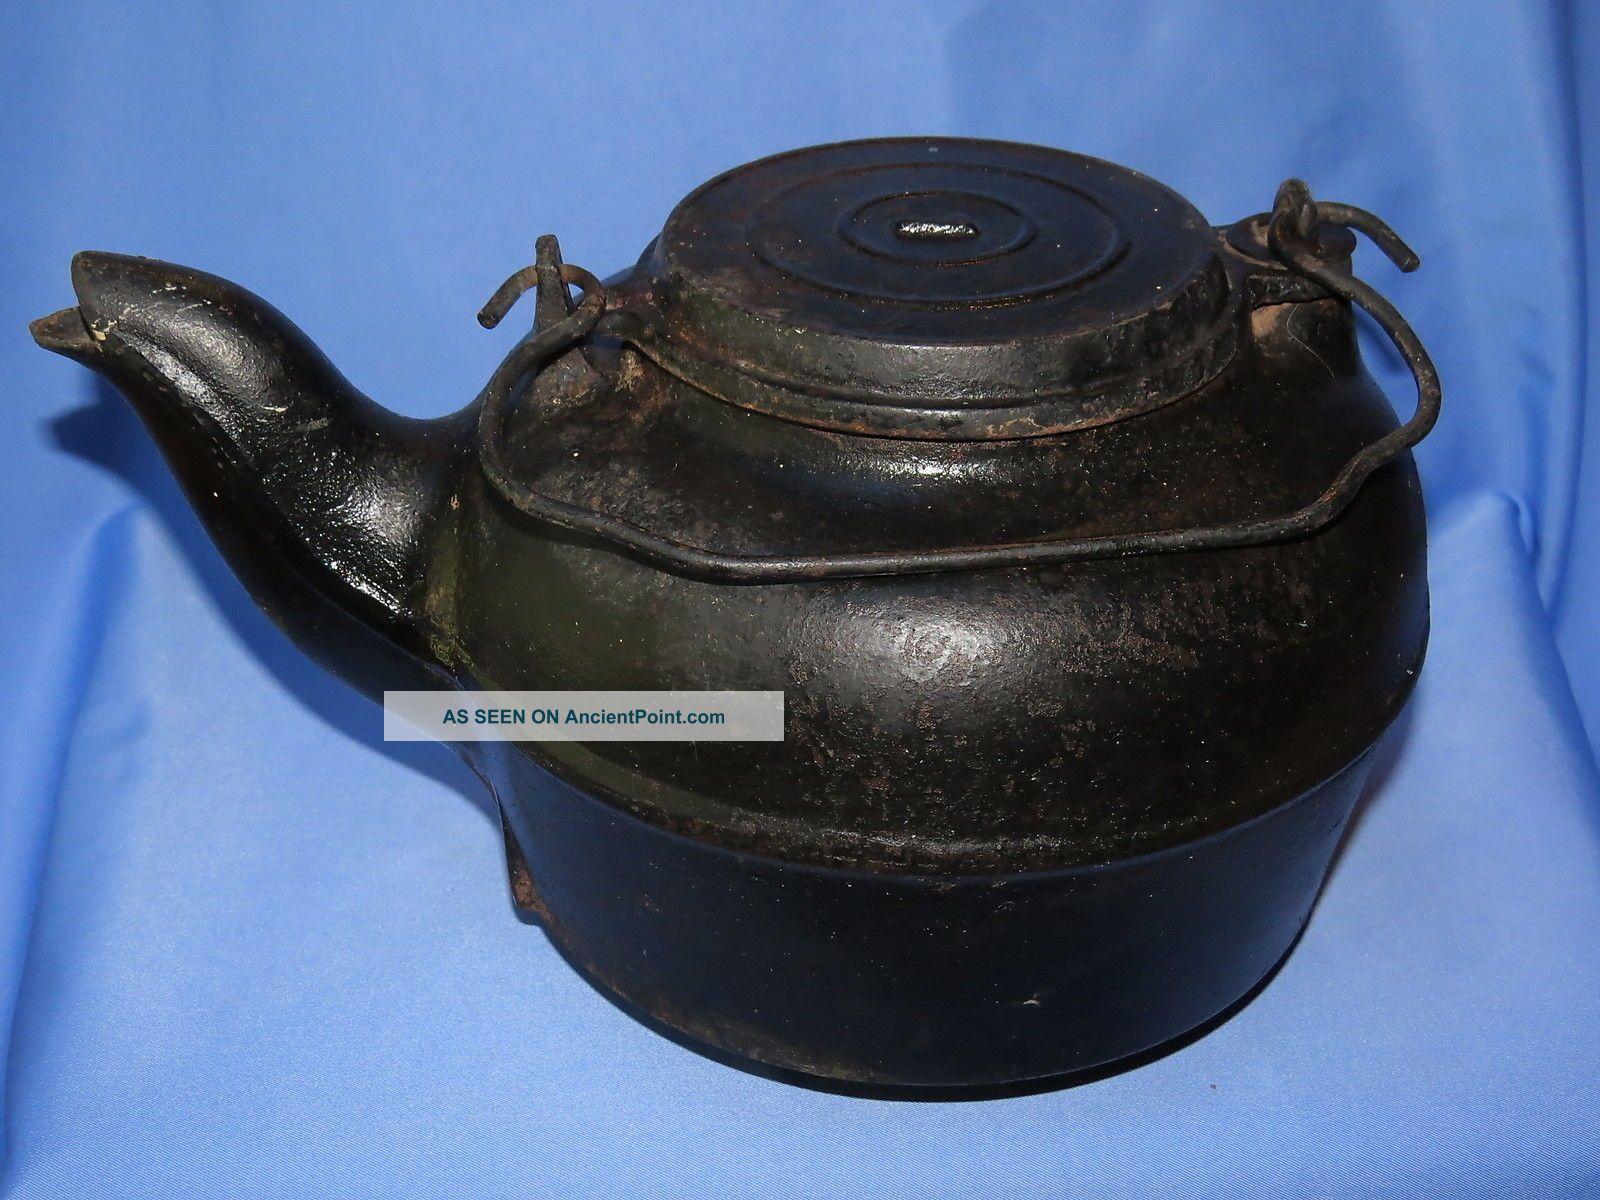 Cast Iron Primitive Anitque Hearth Cooking Tea Kettle Pot W/sliding Cover 7 Hearth Ware photo